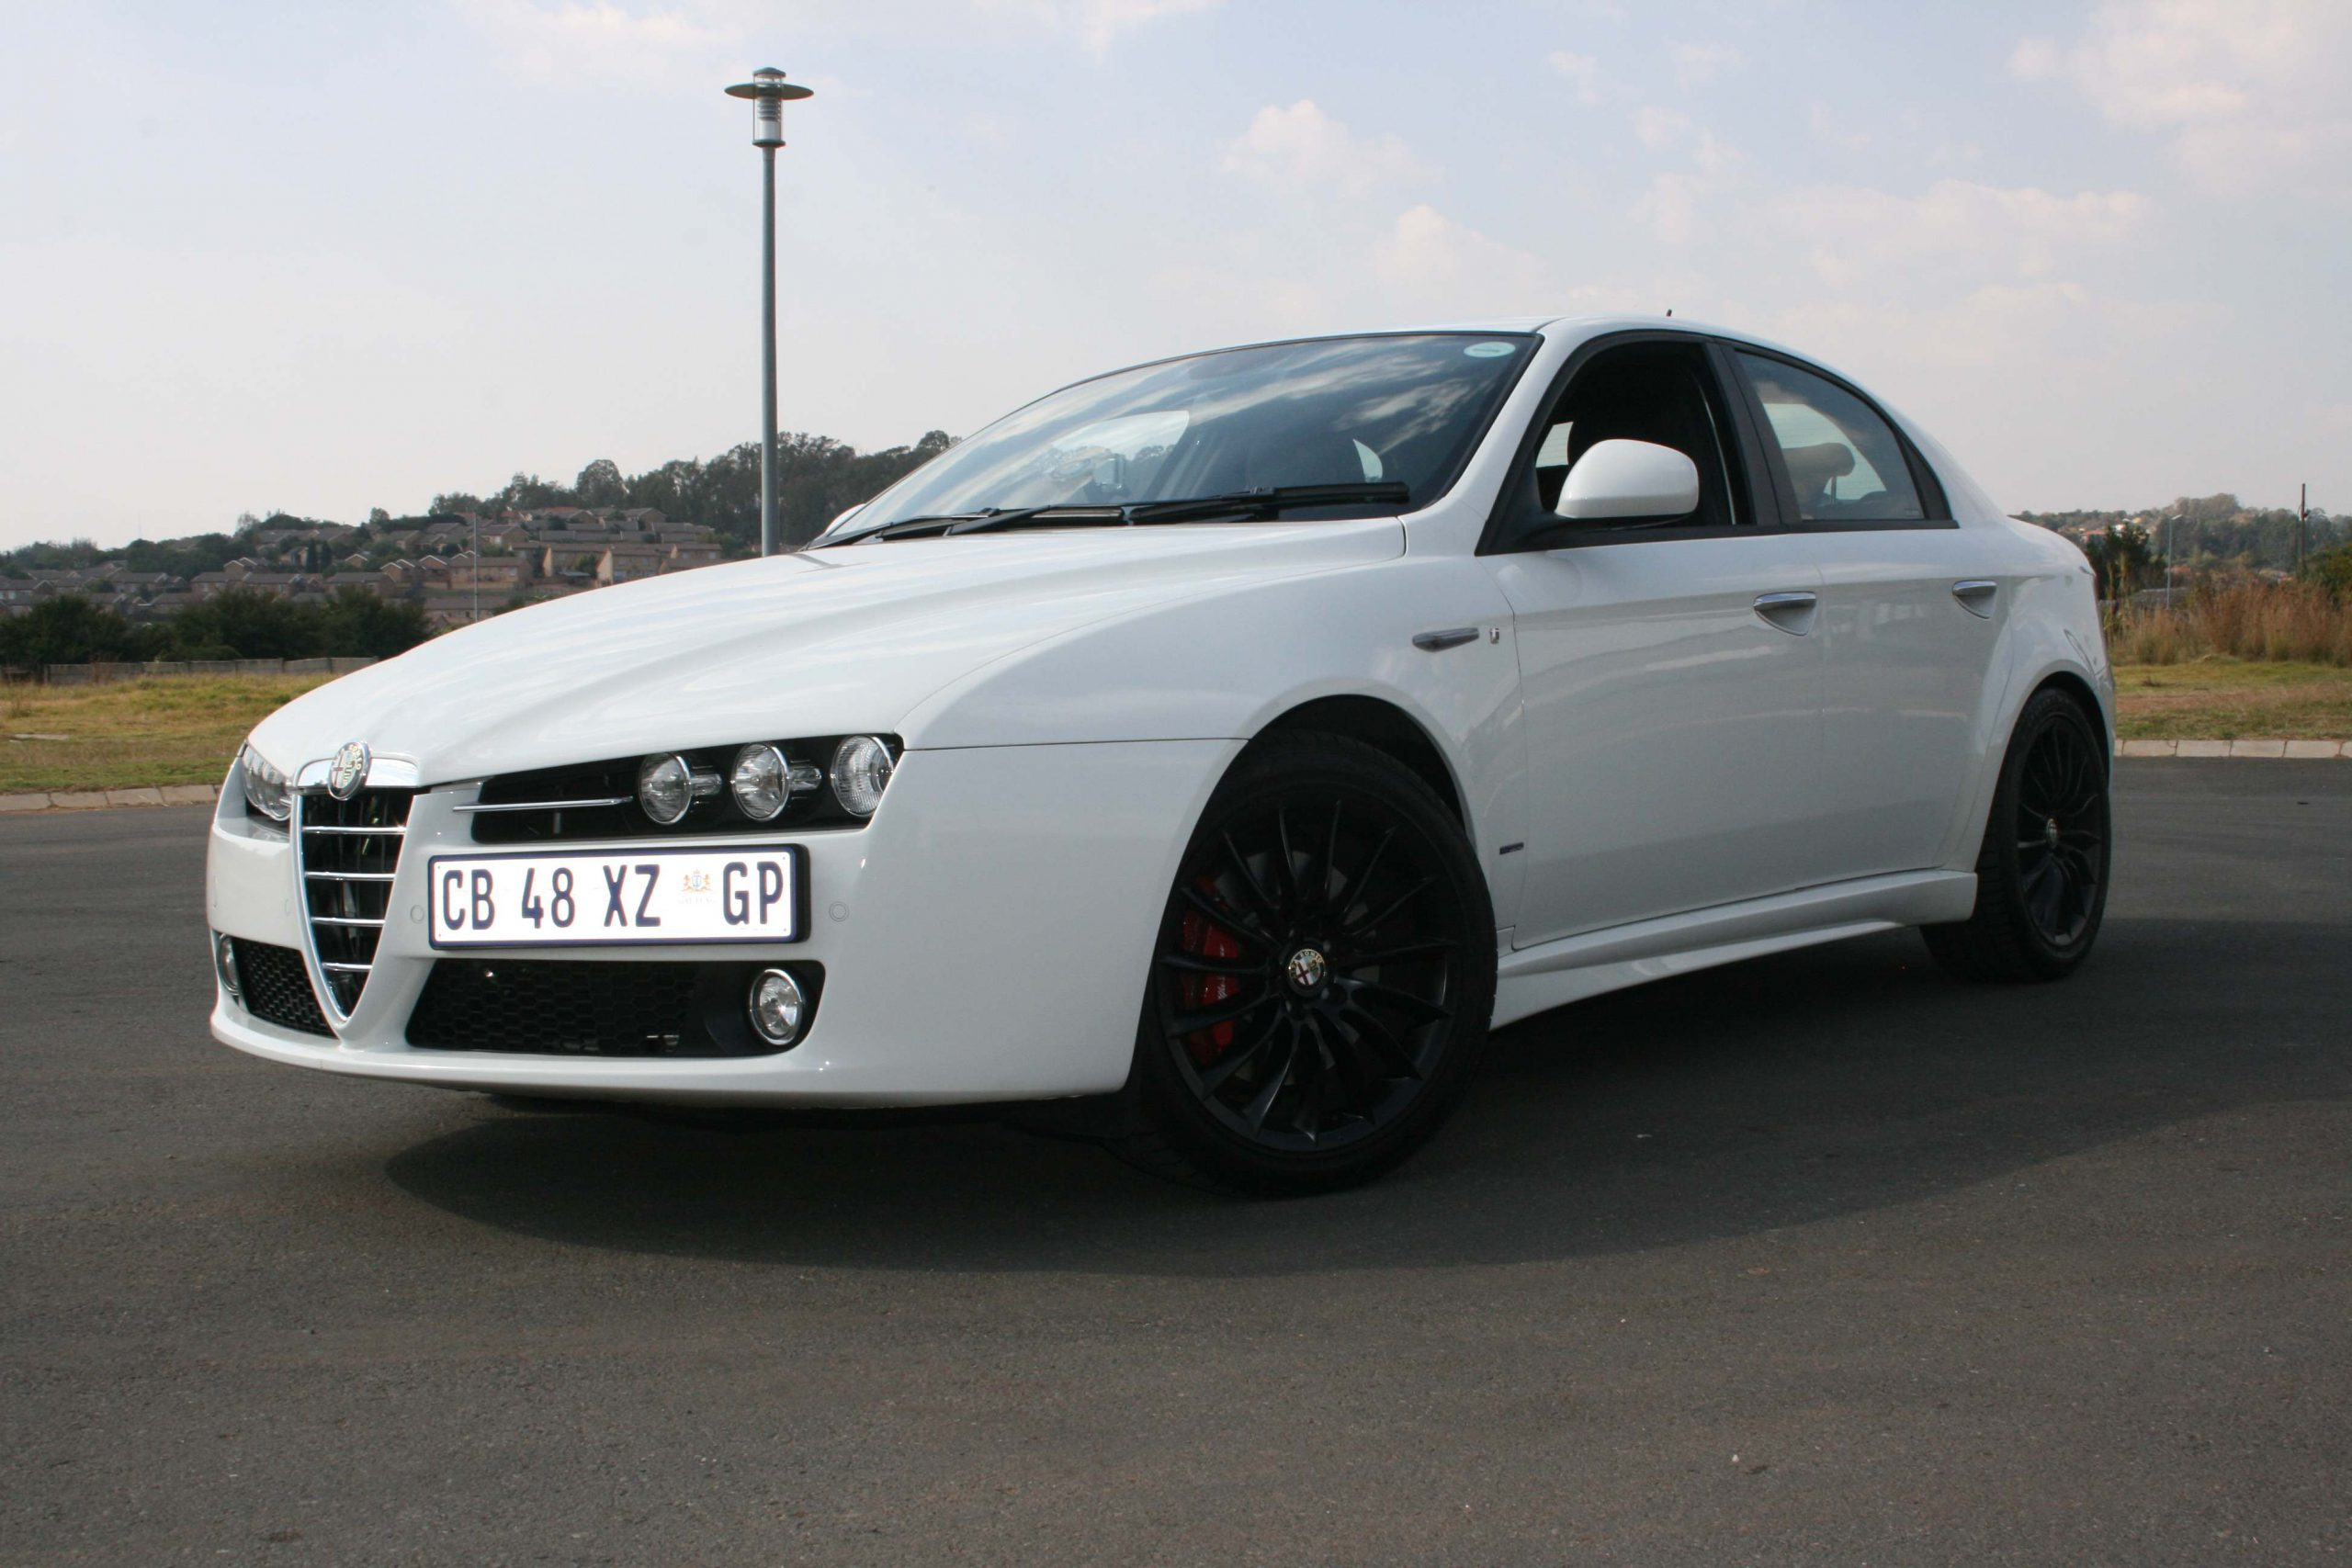 Alfa Romeo Used Car Review And Buyers Guide - Alfa romeo used cars